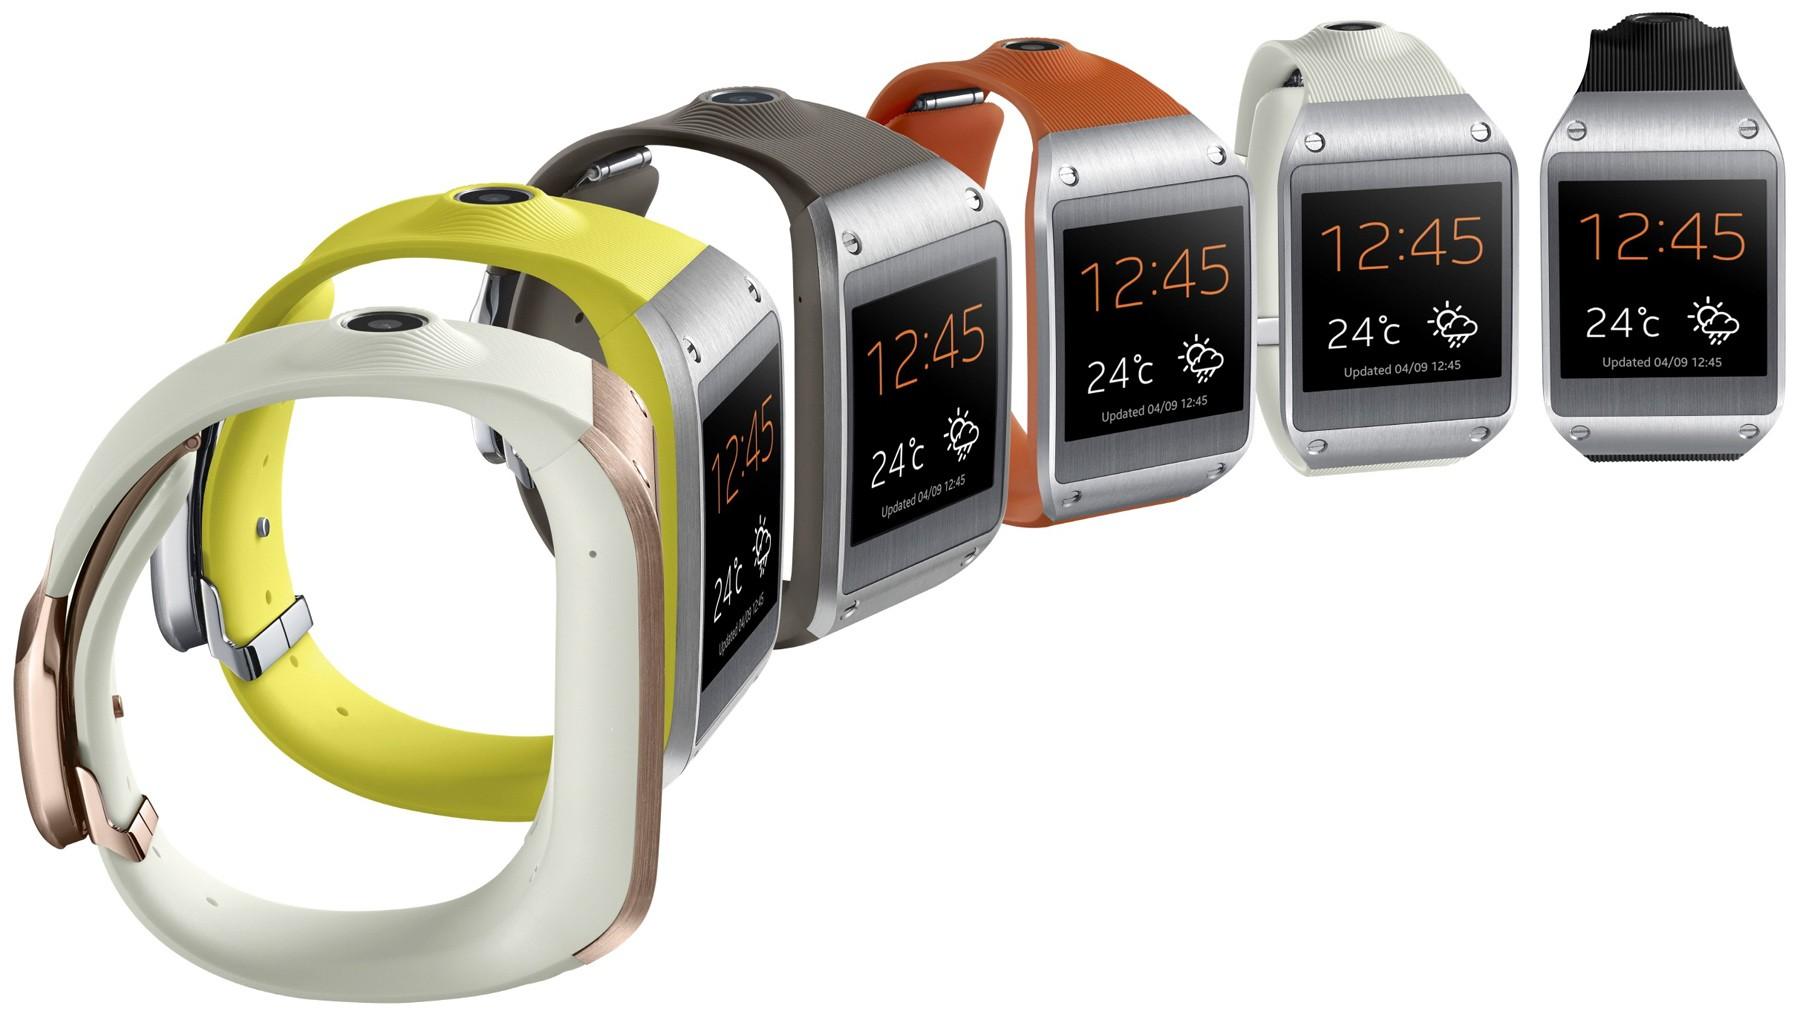 Galaxy Gear tương thích với Galaxy S III, S4, Note II